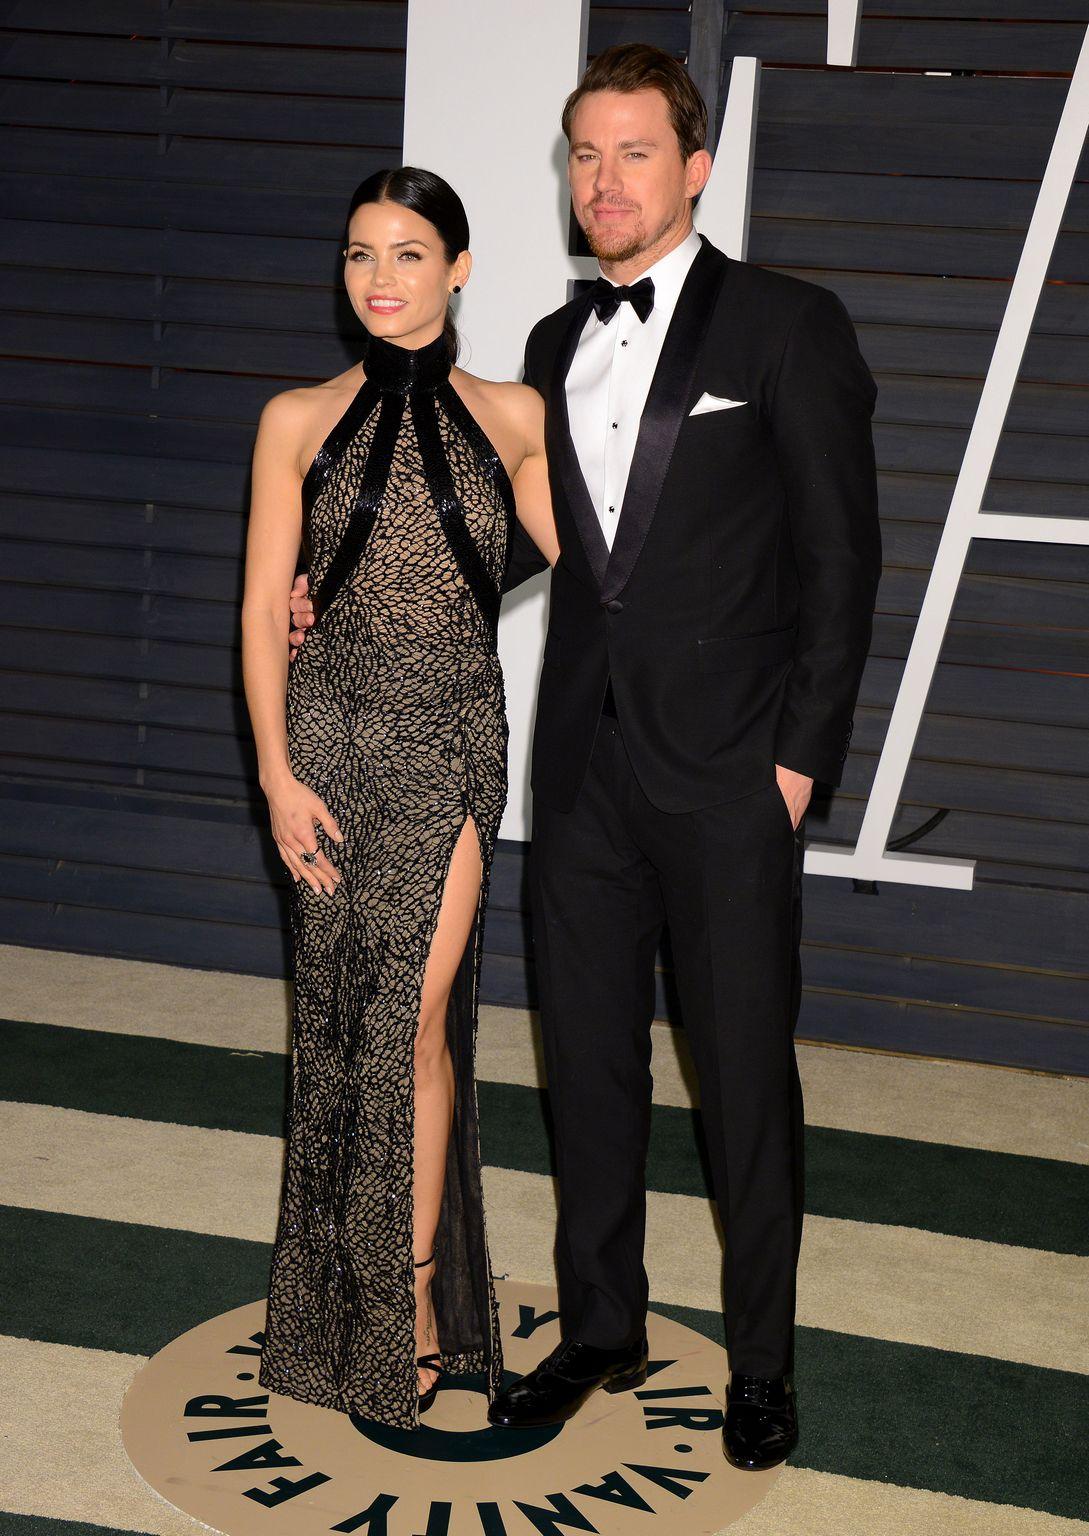 Channing Tatum and Jenna Dewan At Vanity Fair Oscar Party-1